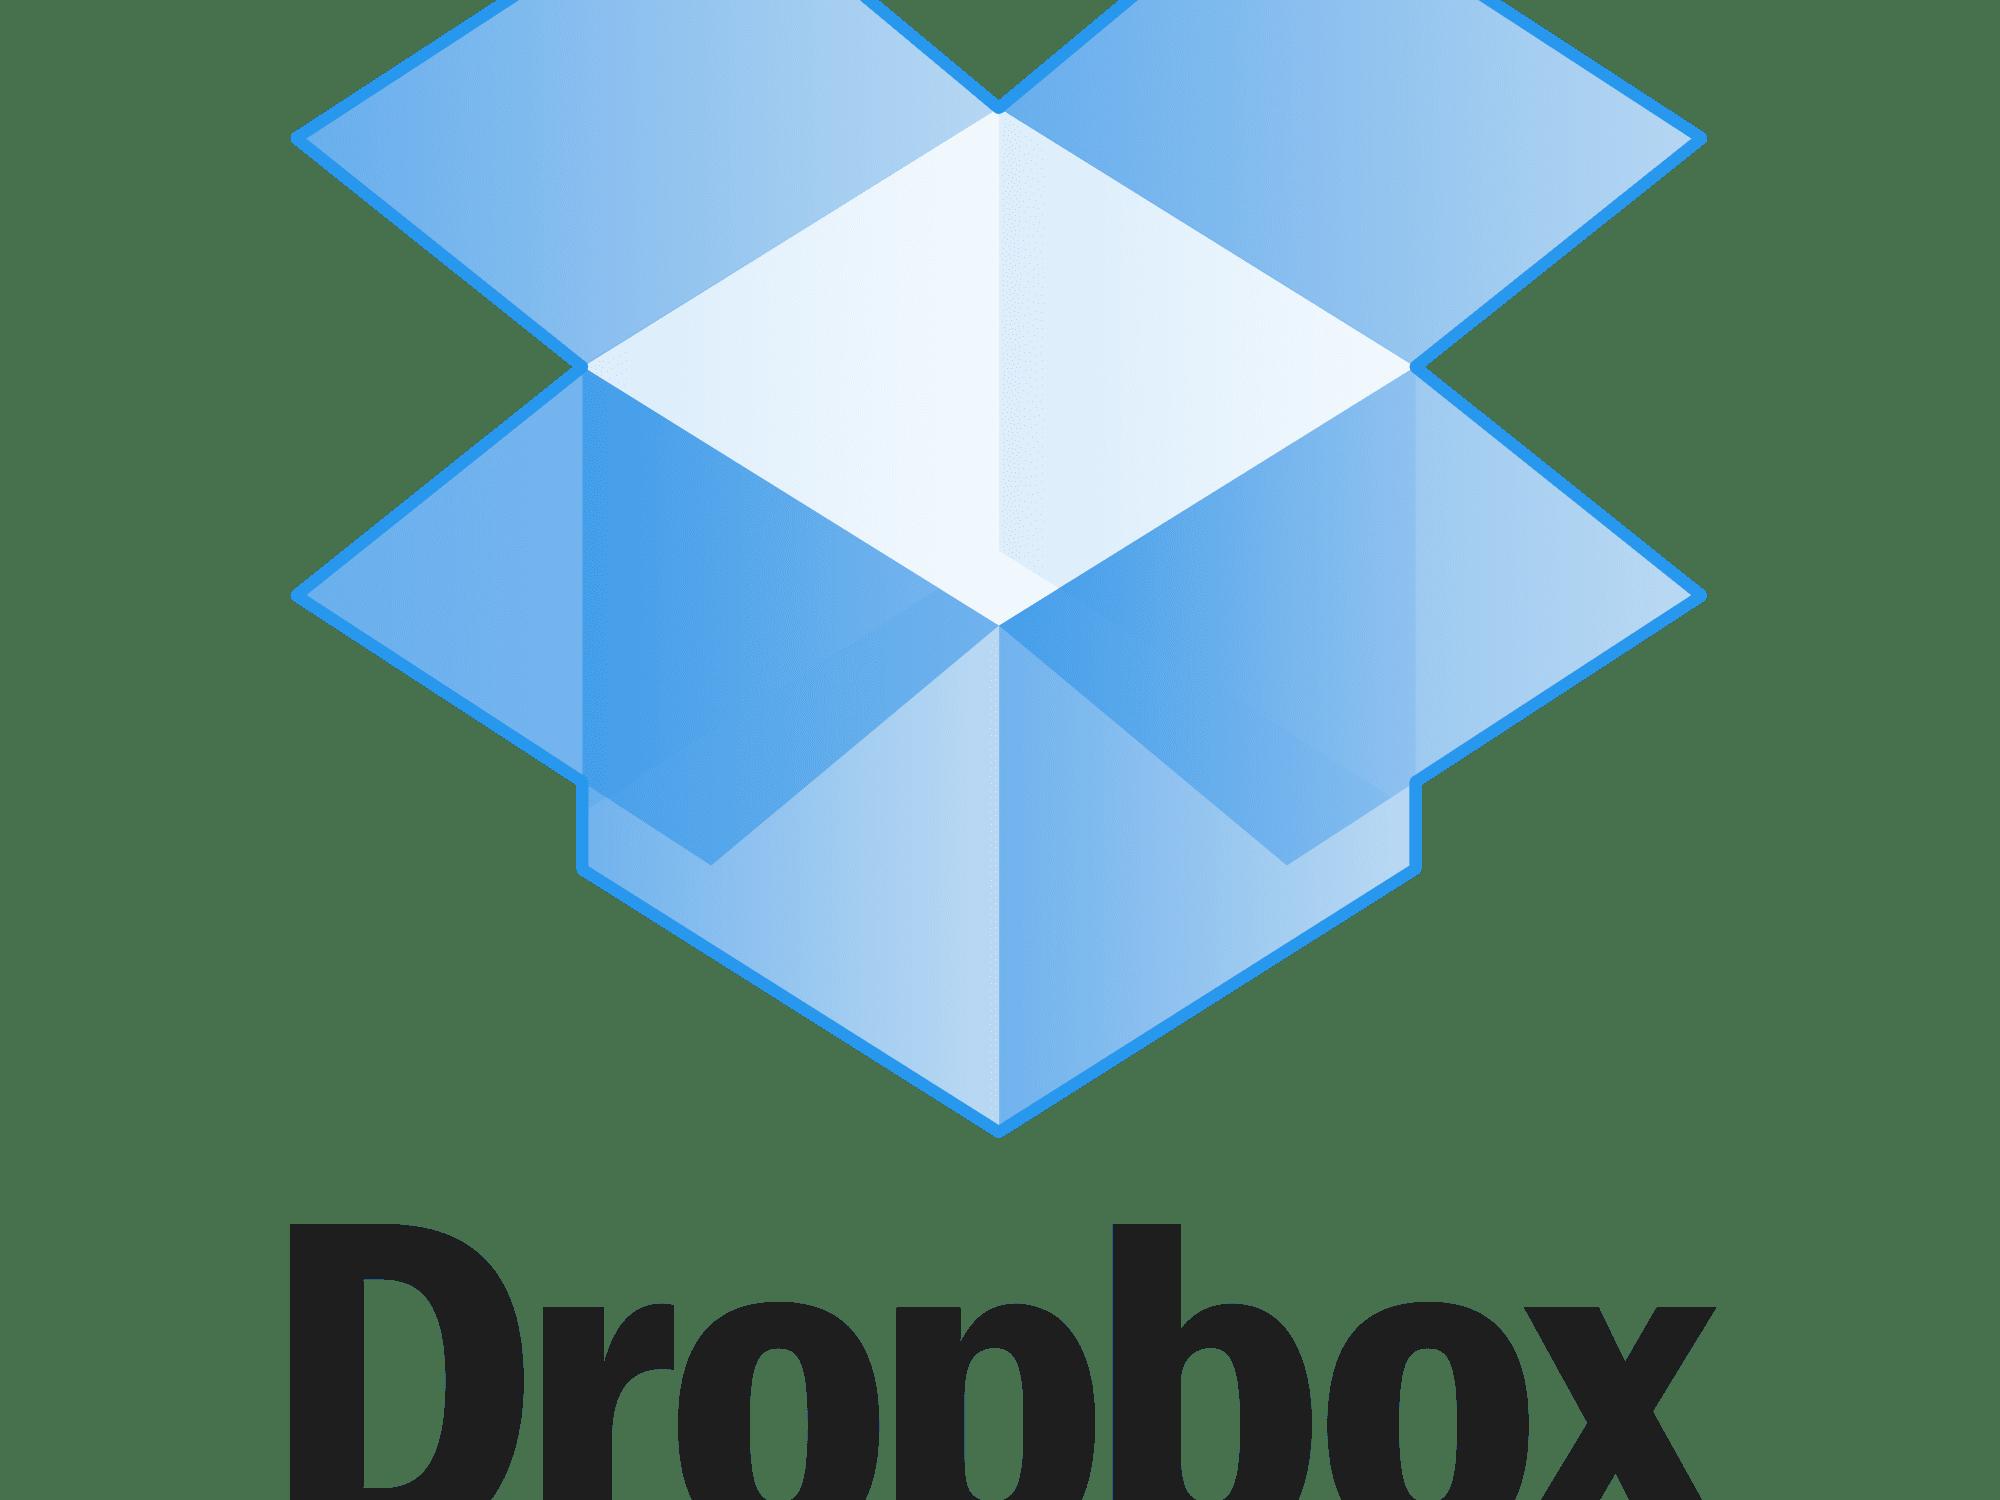 descargar dropbox para windows 10 gratis